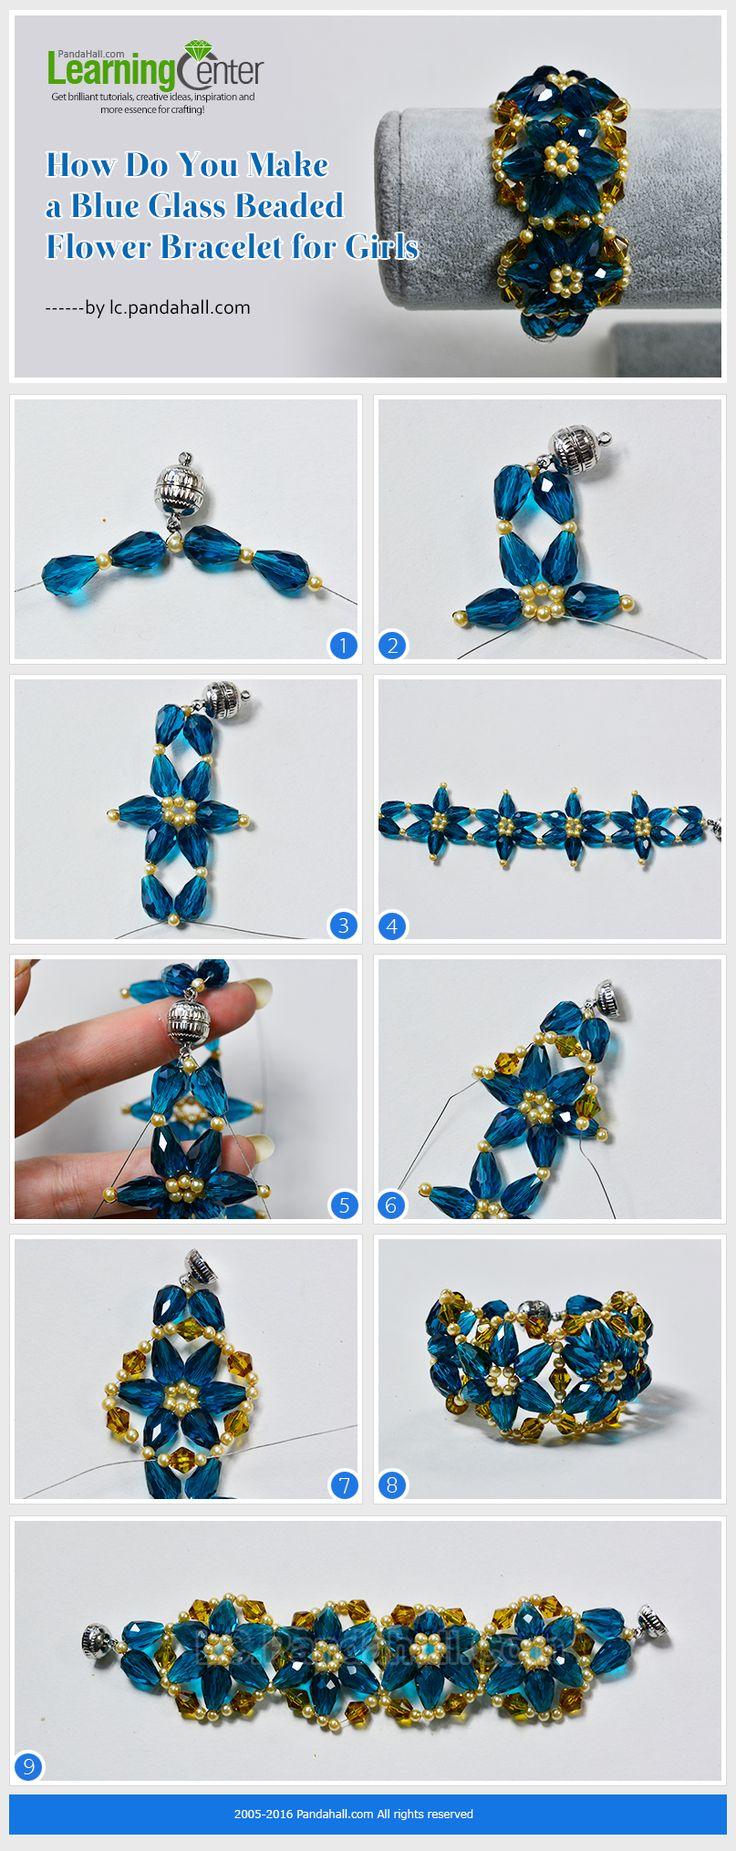 How Do You Make a Blue Glass Beaded Flower Bracelet for Girls from LC.Pandahall.com